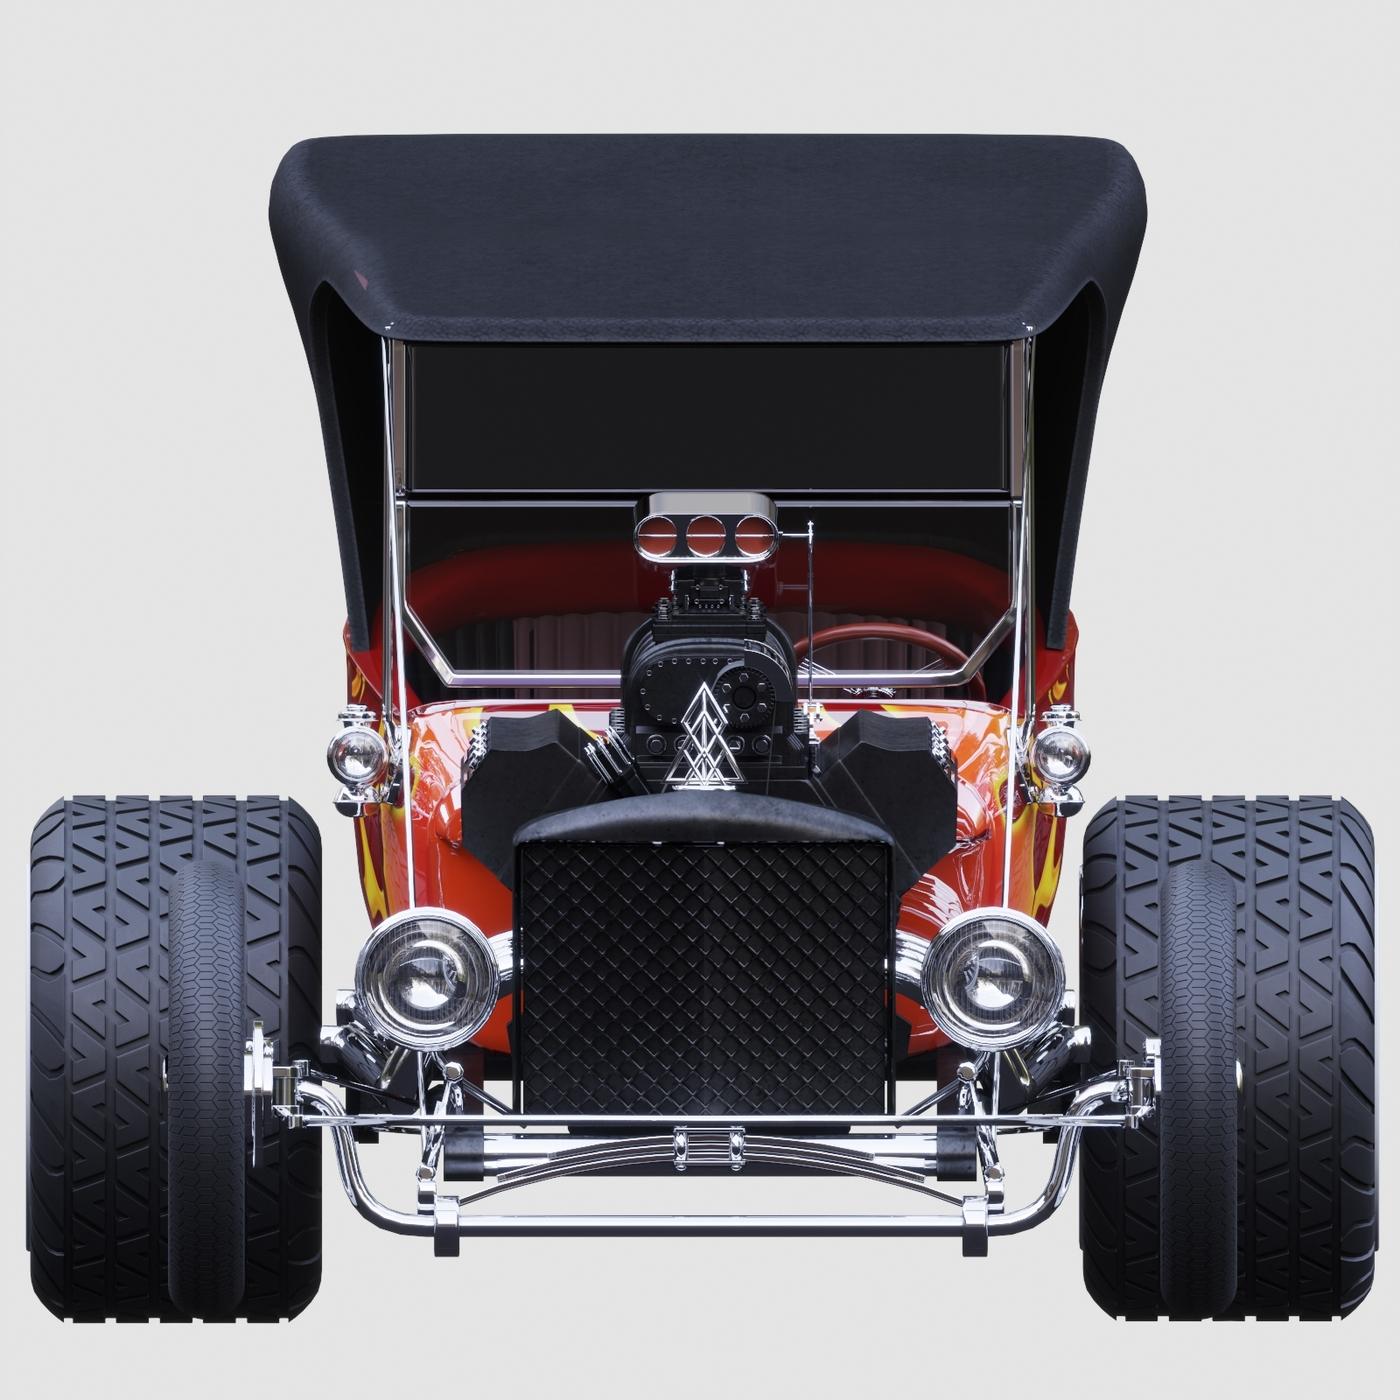 #car hotroad